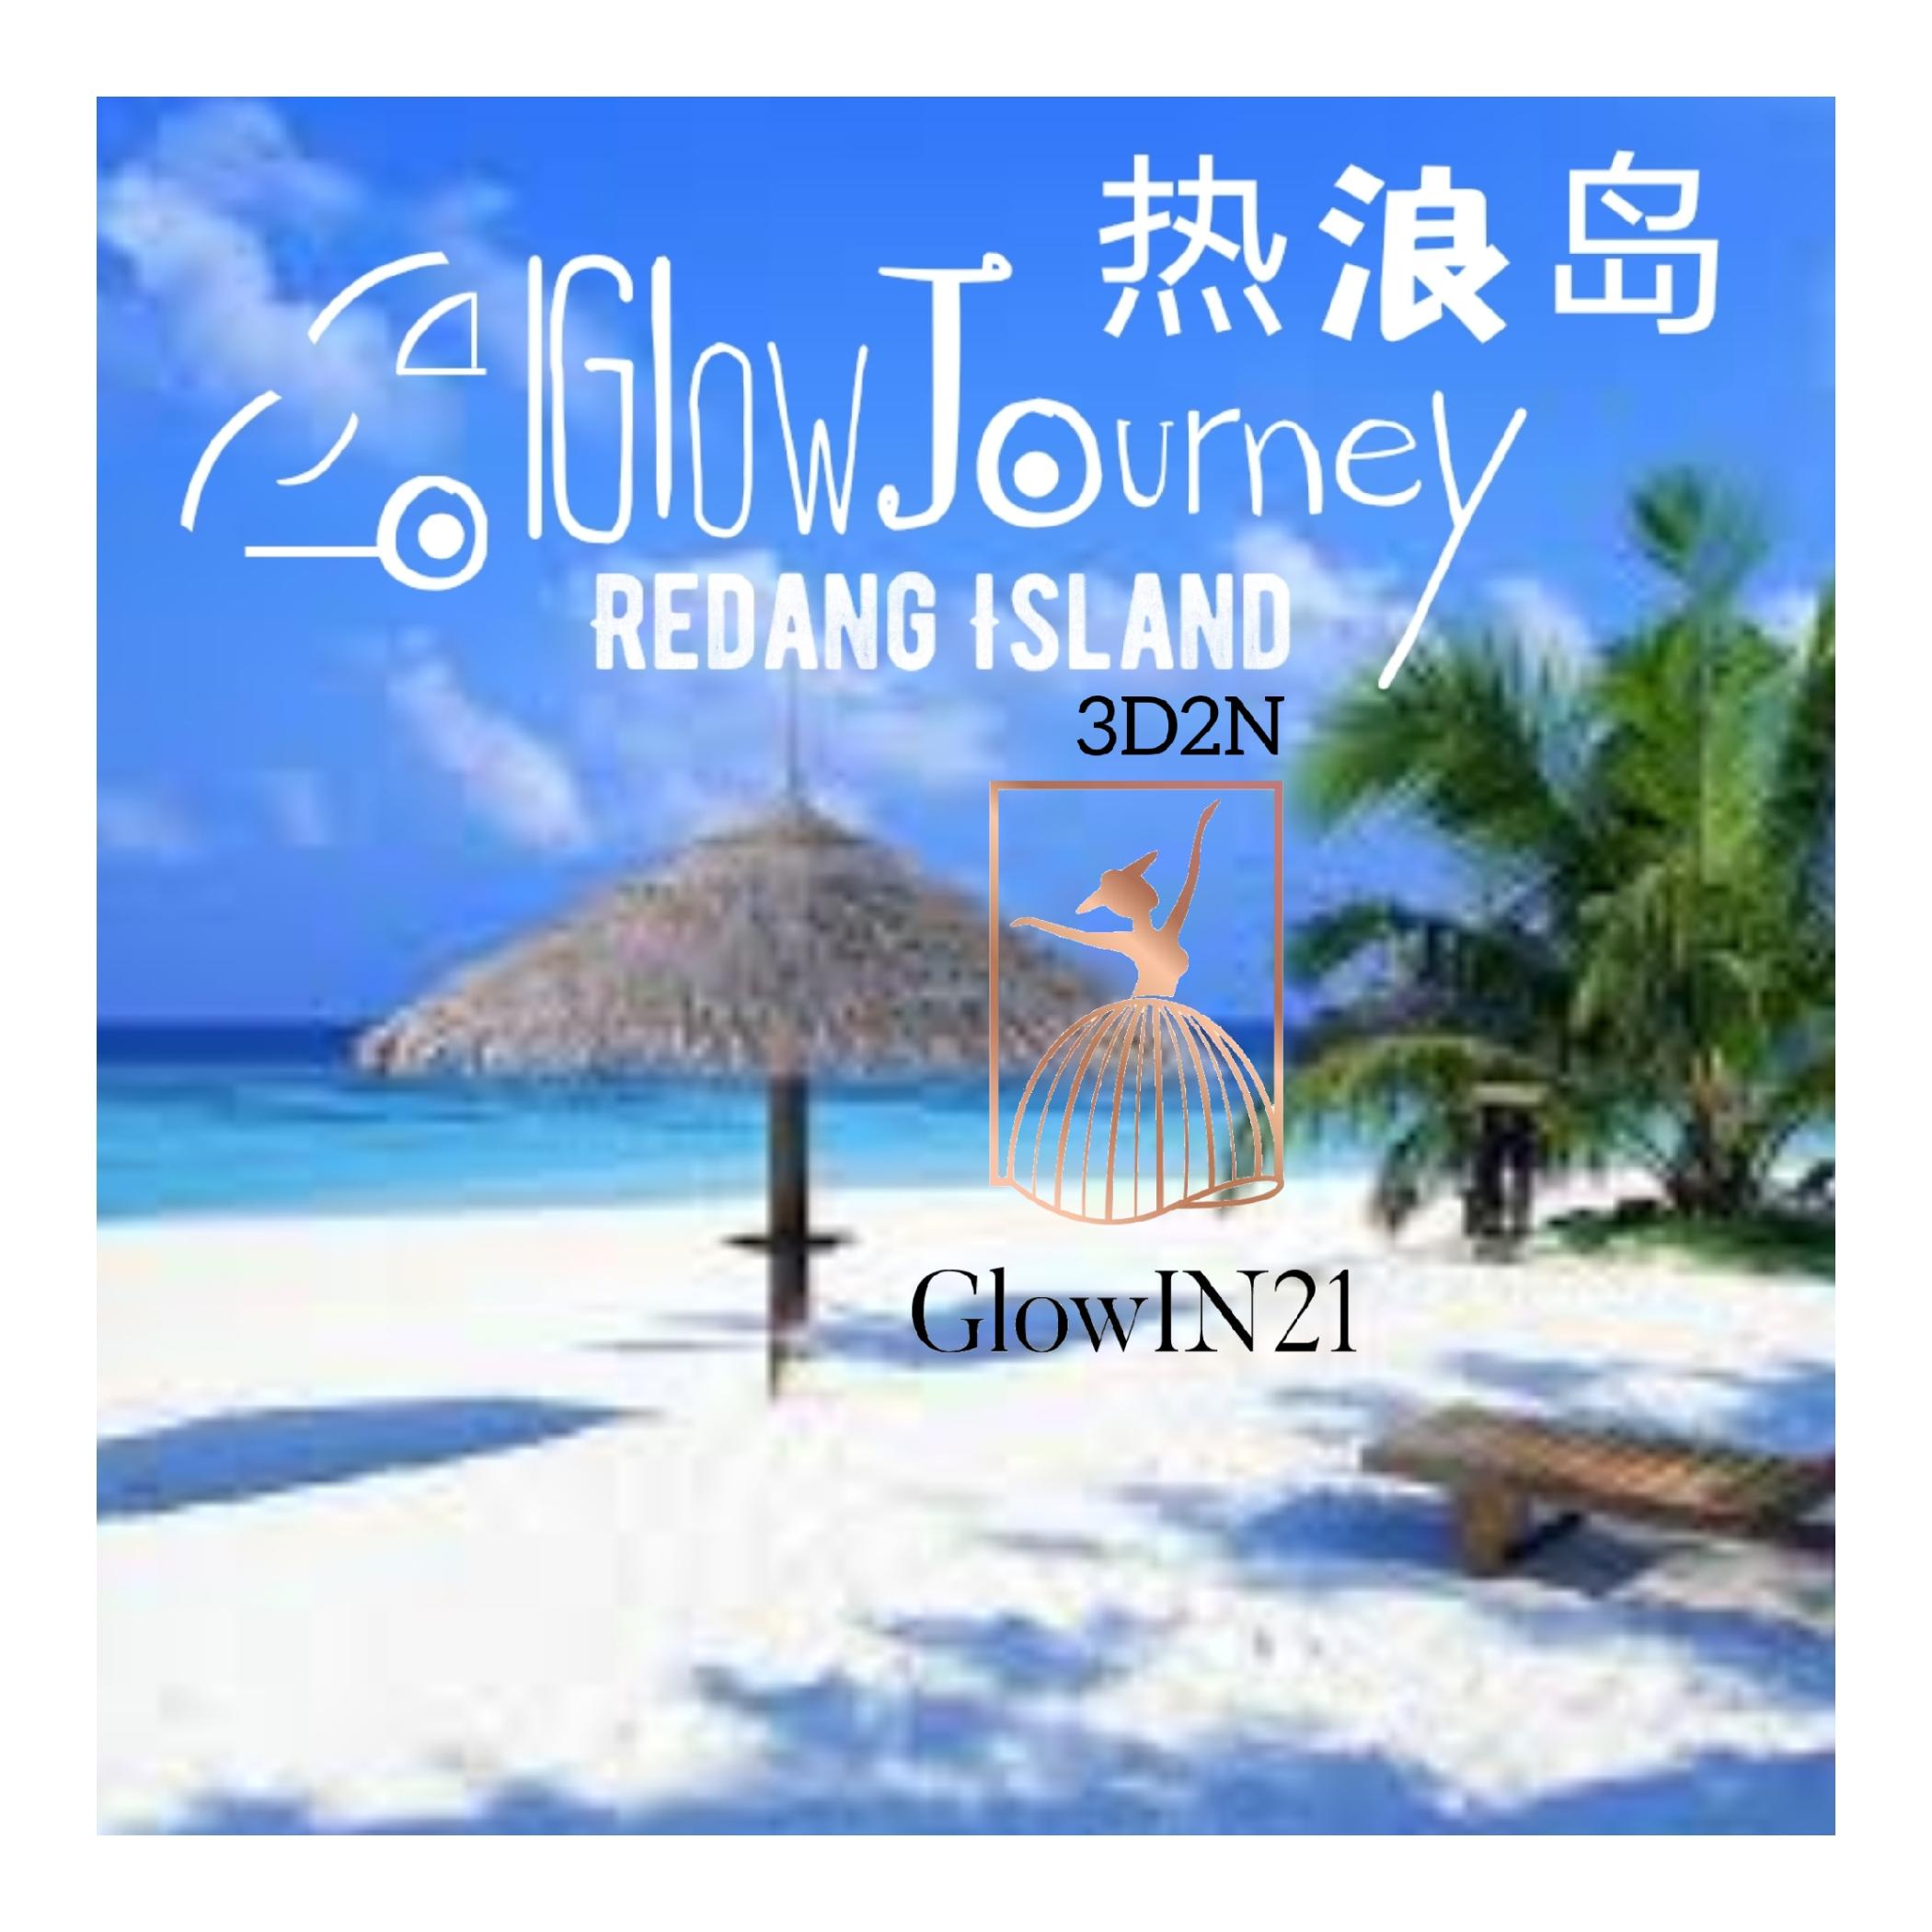 GLOWIN21 6个月团队热浪岛半年旅游奖励